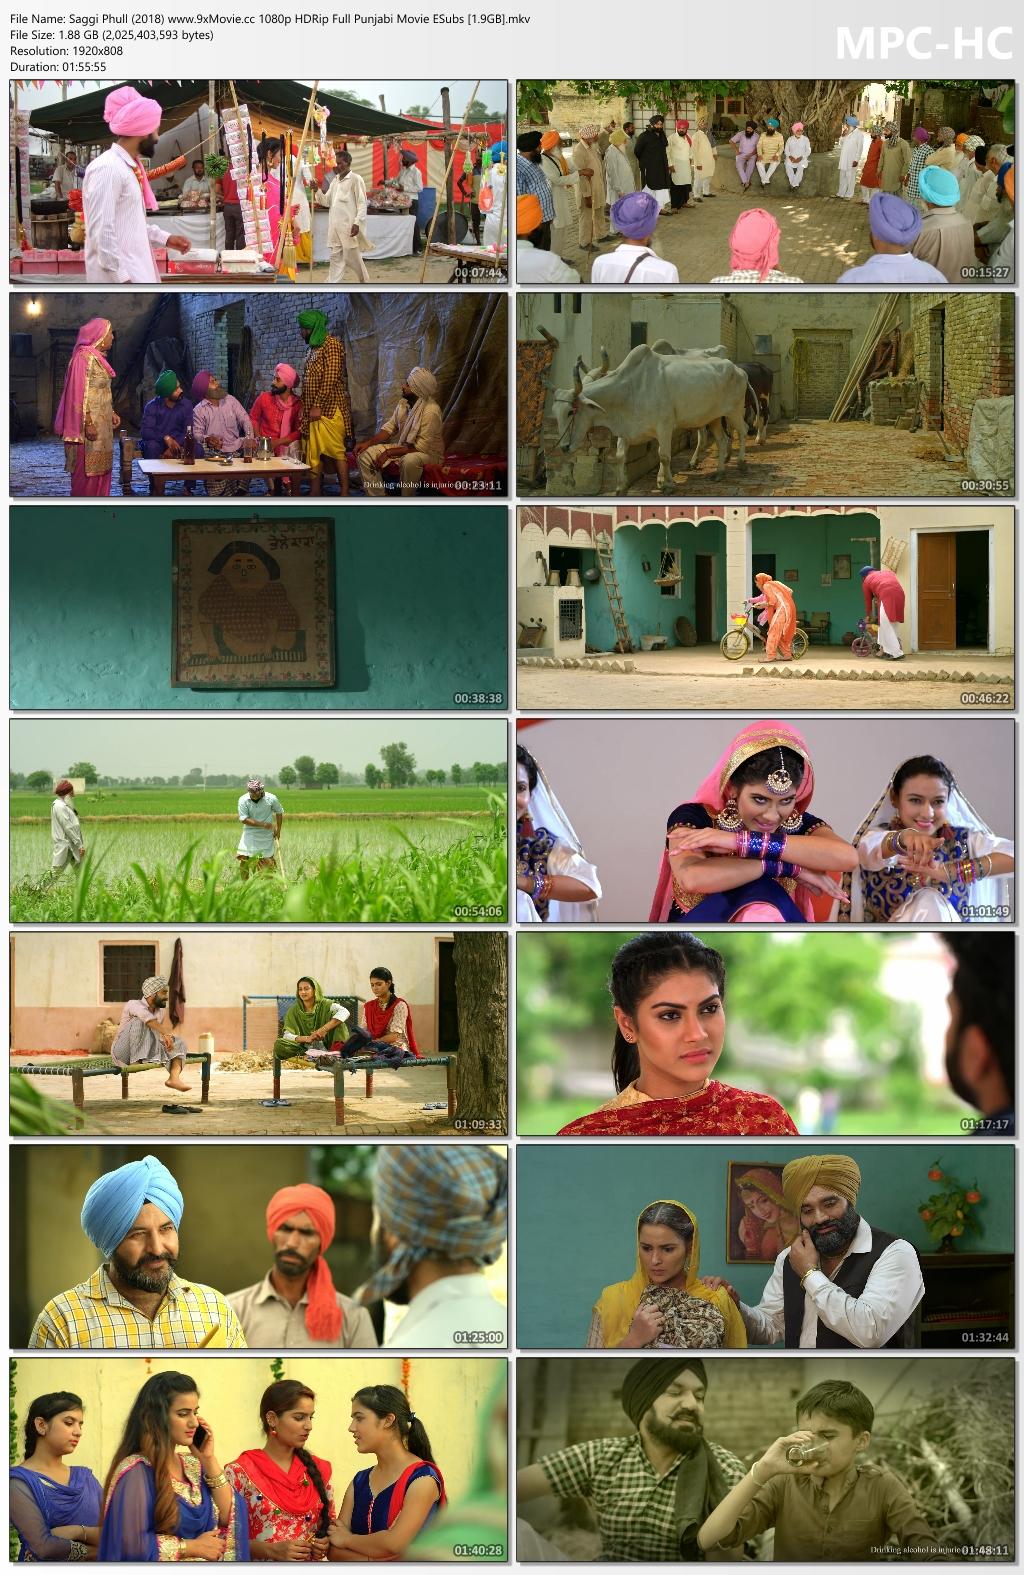 Saggi-Phull-2018-www-9x-Movie-cc-1080p-HDRip-Full-Punjabi-Movie-ESubs-1-9-GB-mkv